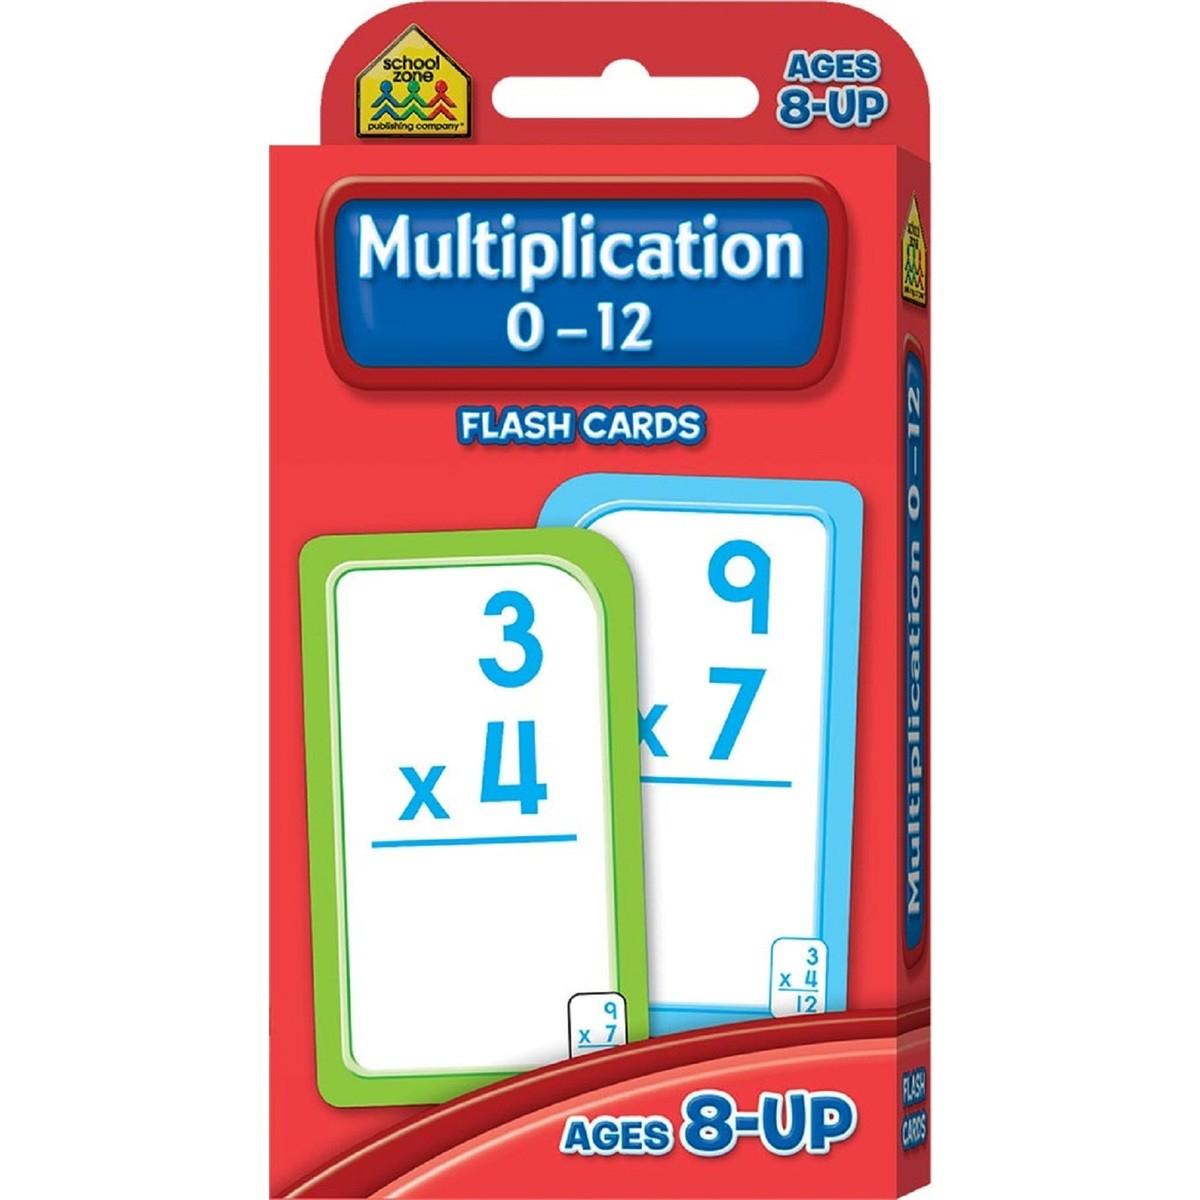 School Zone Multiplication 0-12 Flash Cards